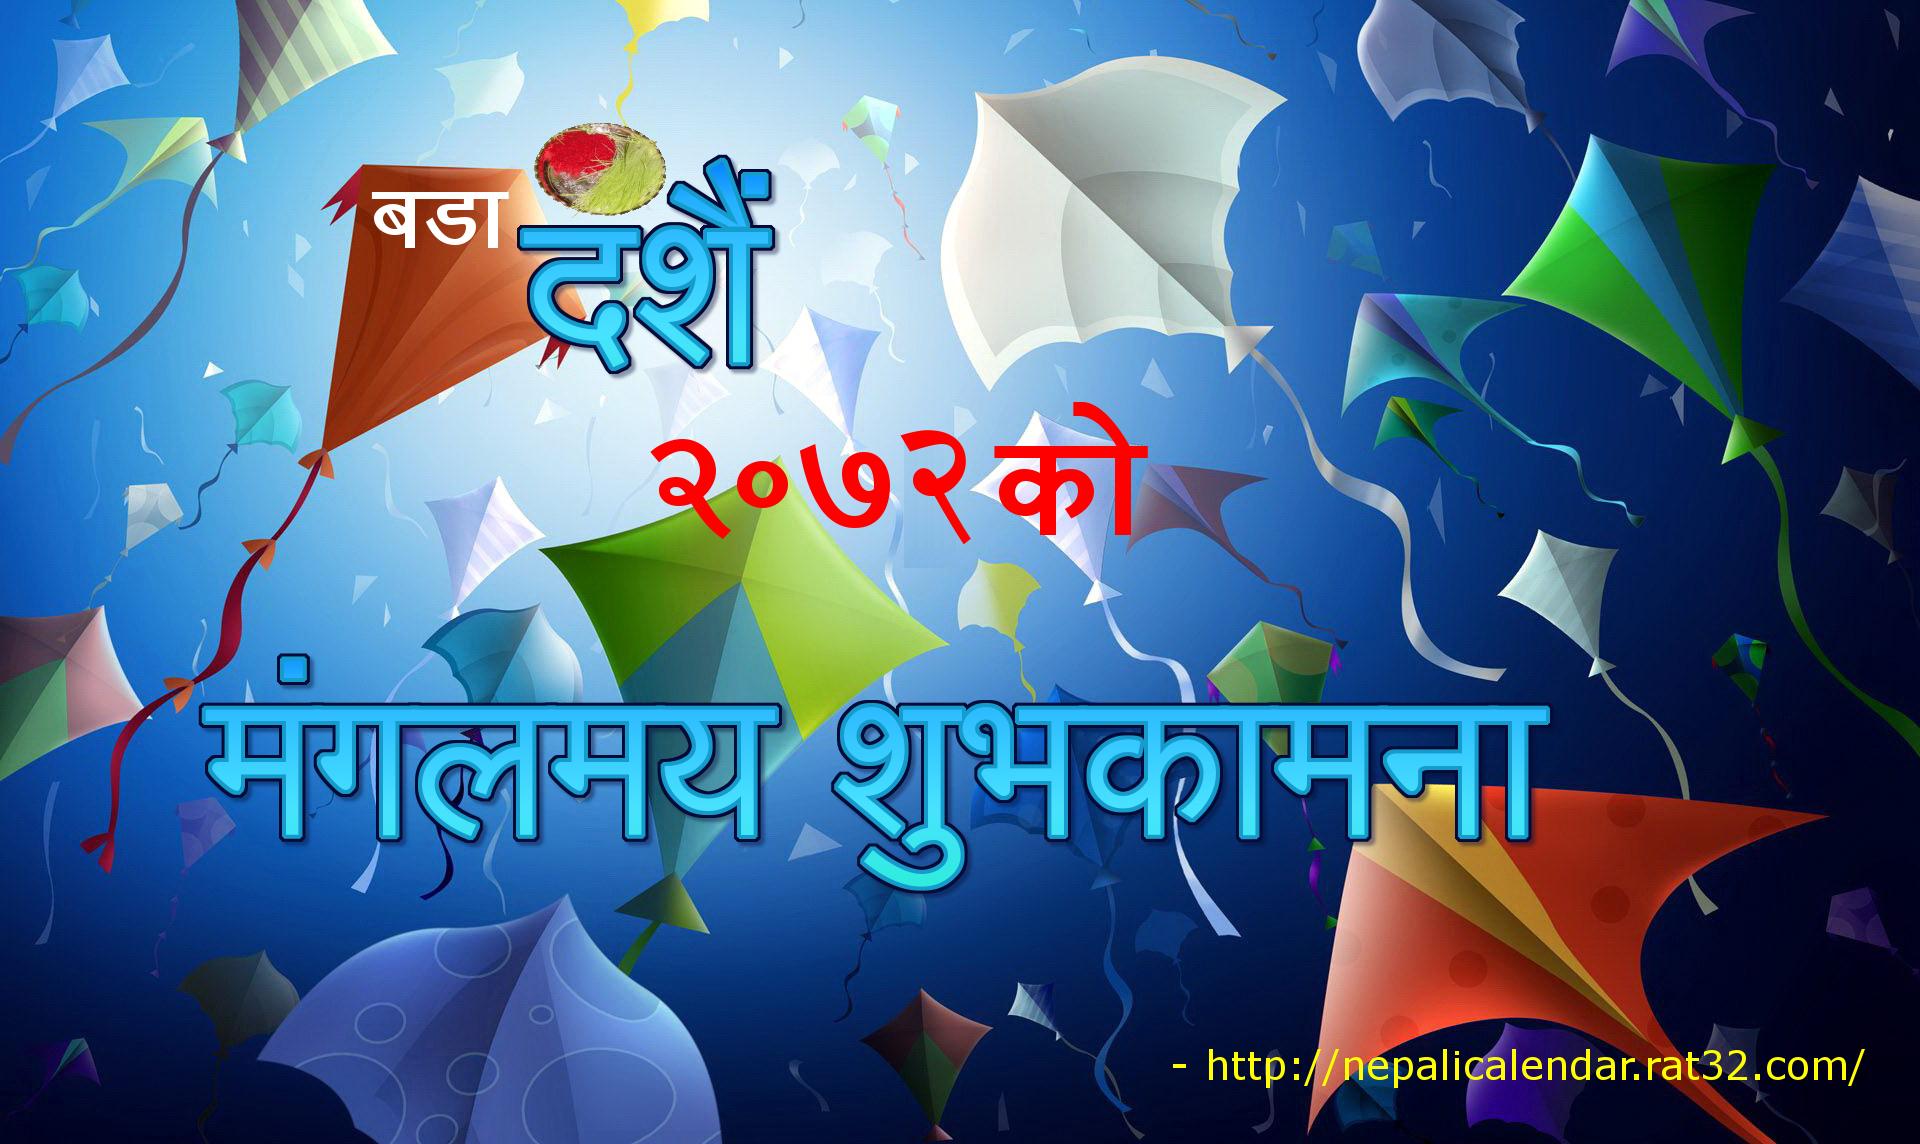 ... Nepali Calendar 2072, 2072 cards, 2072 BS wallpapers, Dashain Tihar